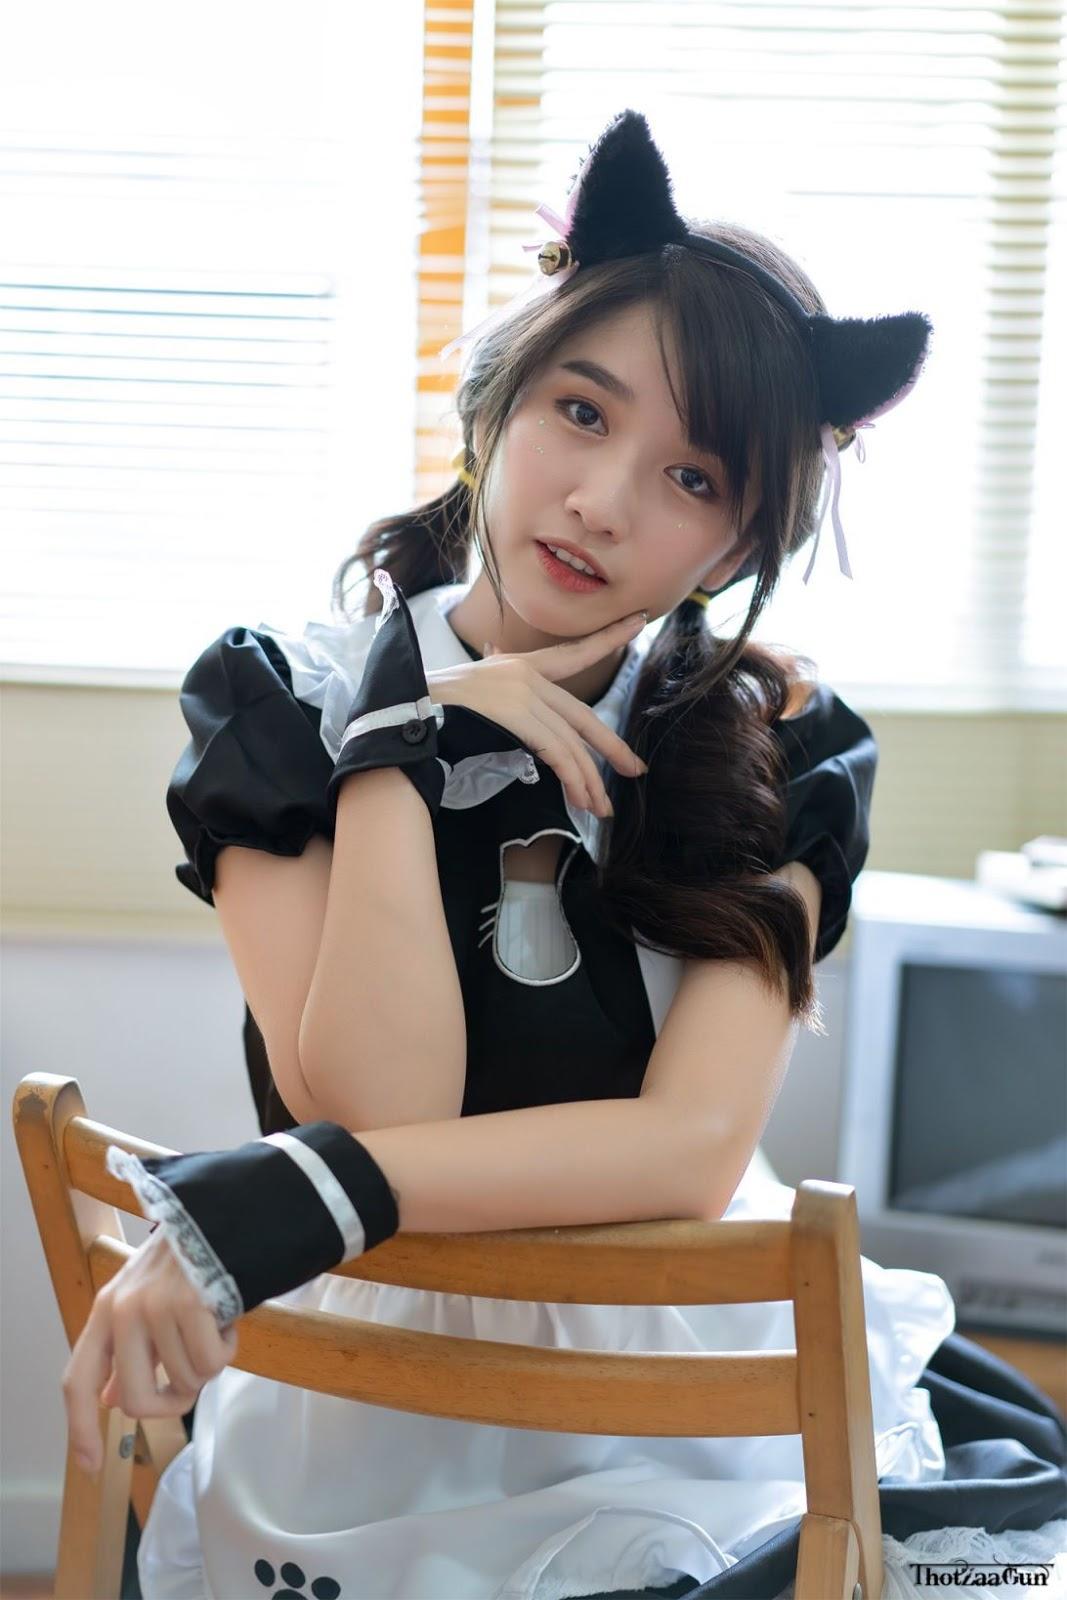 Thailand model: Yatawee Limsiripothong - The cute black cat - TruePic.net